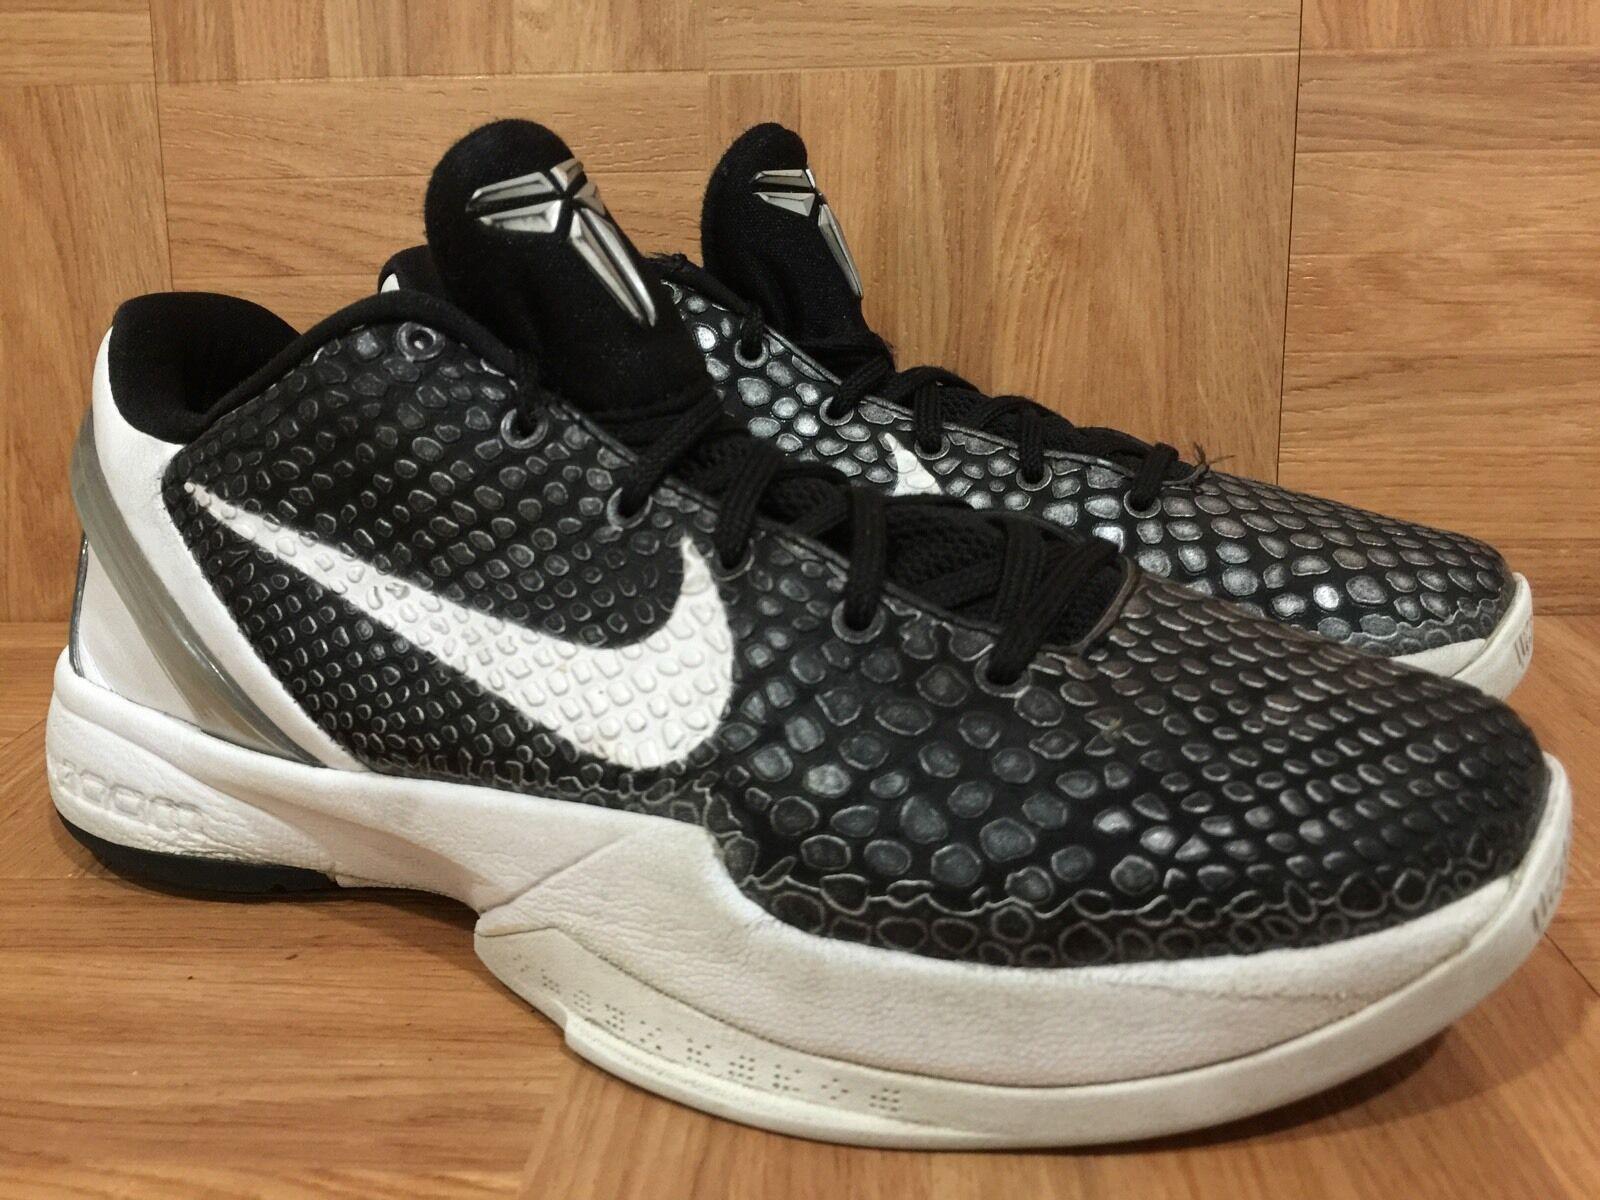 RARE Nike Zoom Kobe VI TB Black Anthracite Metallic Silver Sz 6.5 454142-011